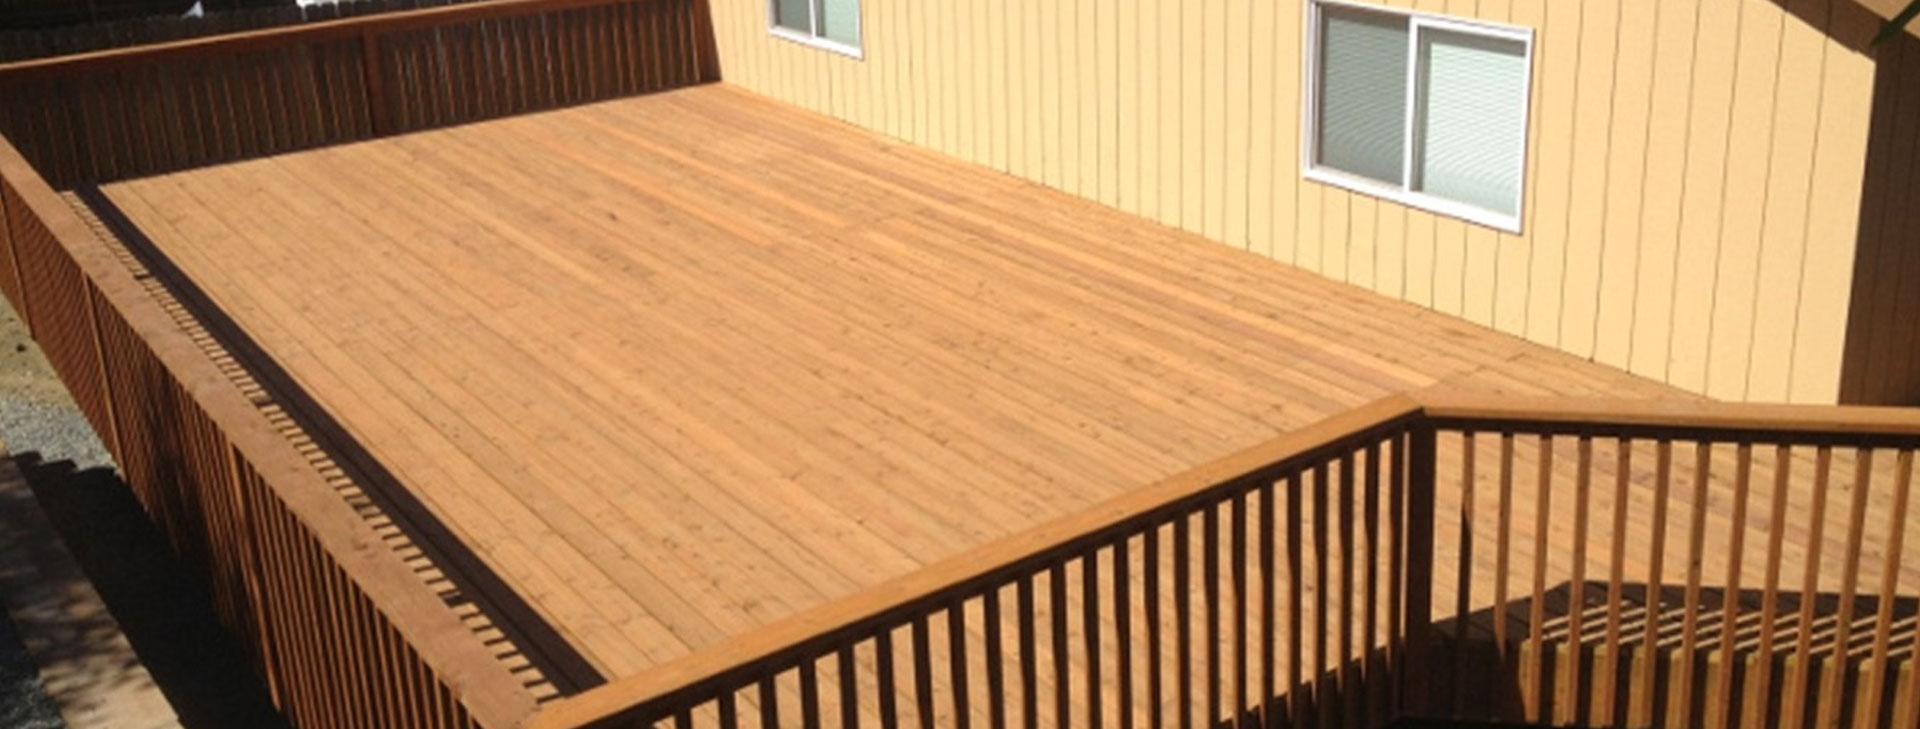 Alaska Fence and Deck Install 3